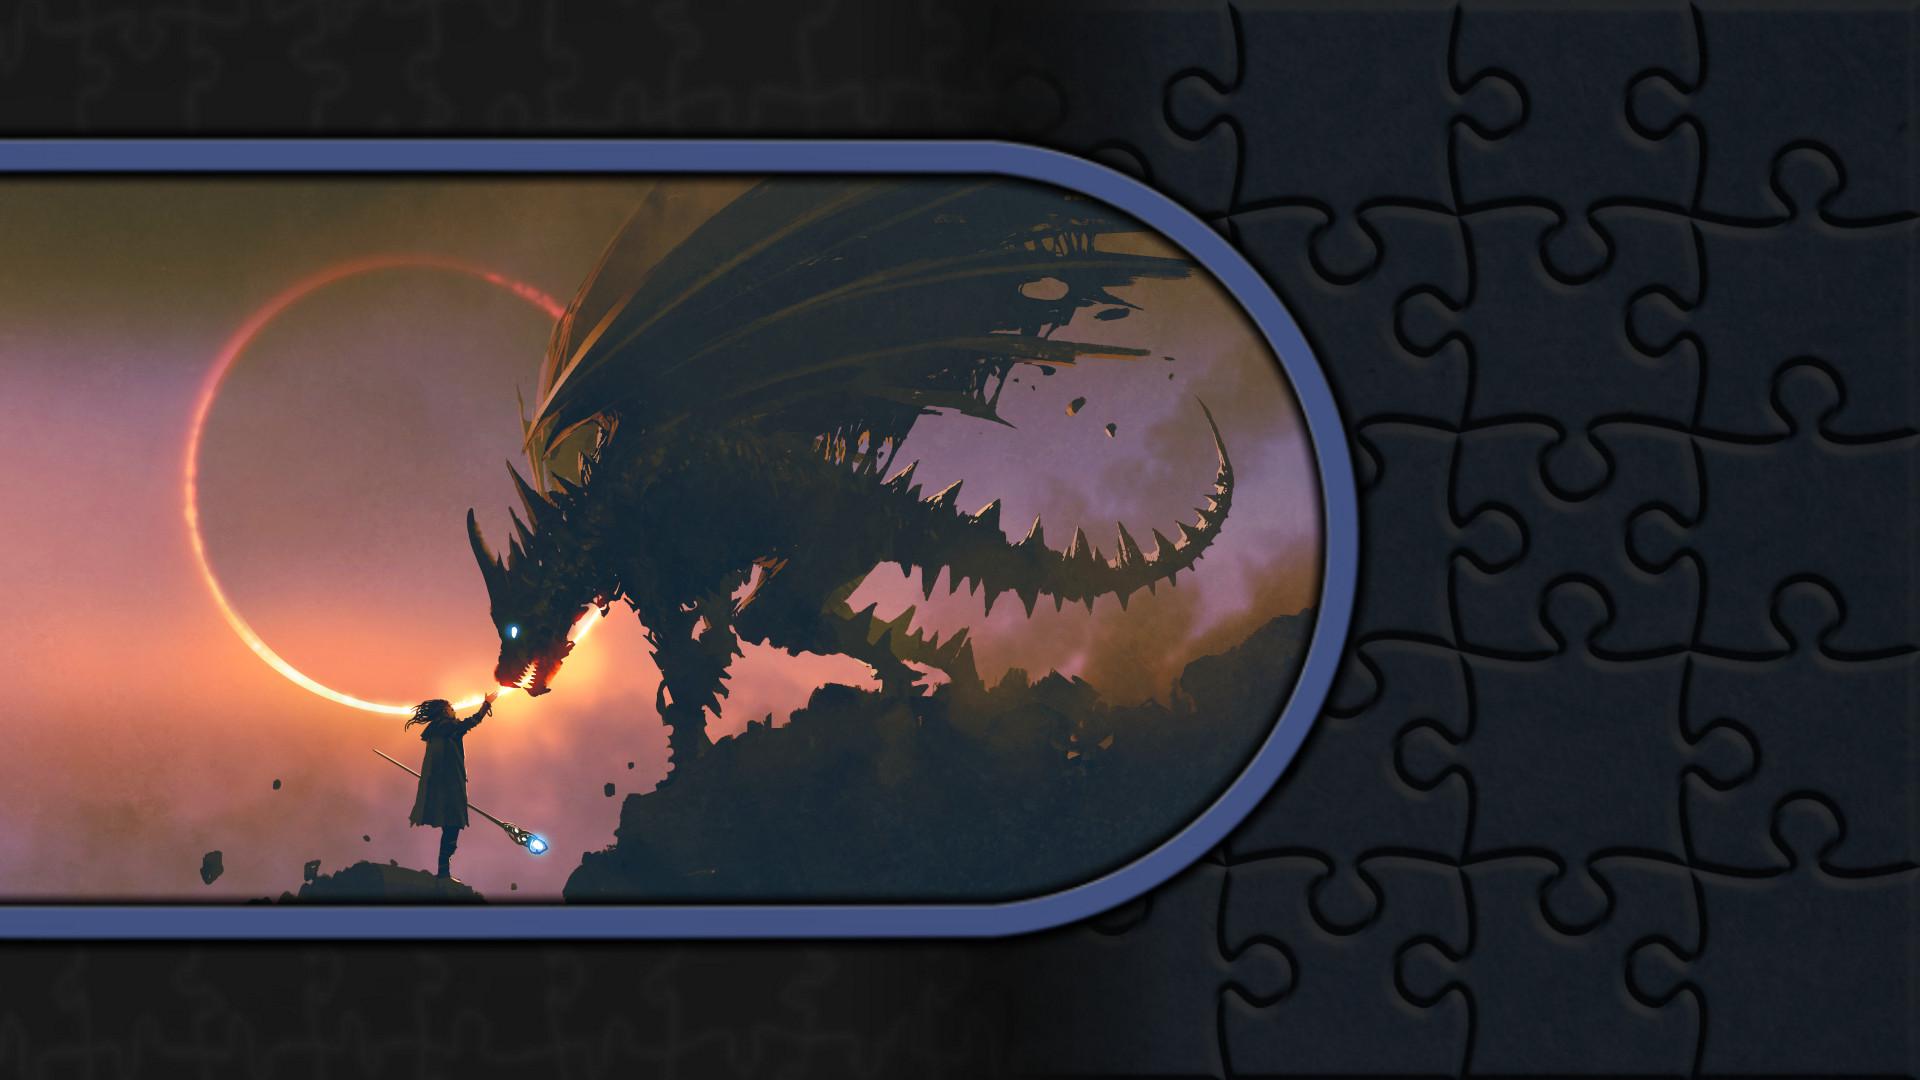 Pixel Puzzles Illustrations & Anime - Jigsaw Pack: Dragons screenshot